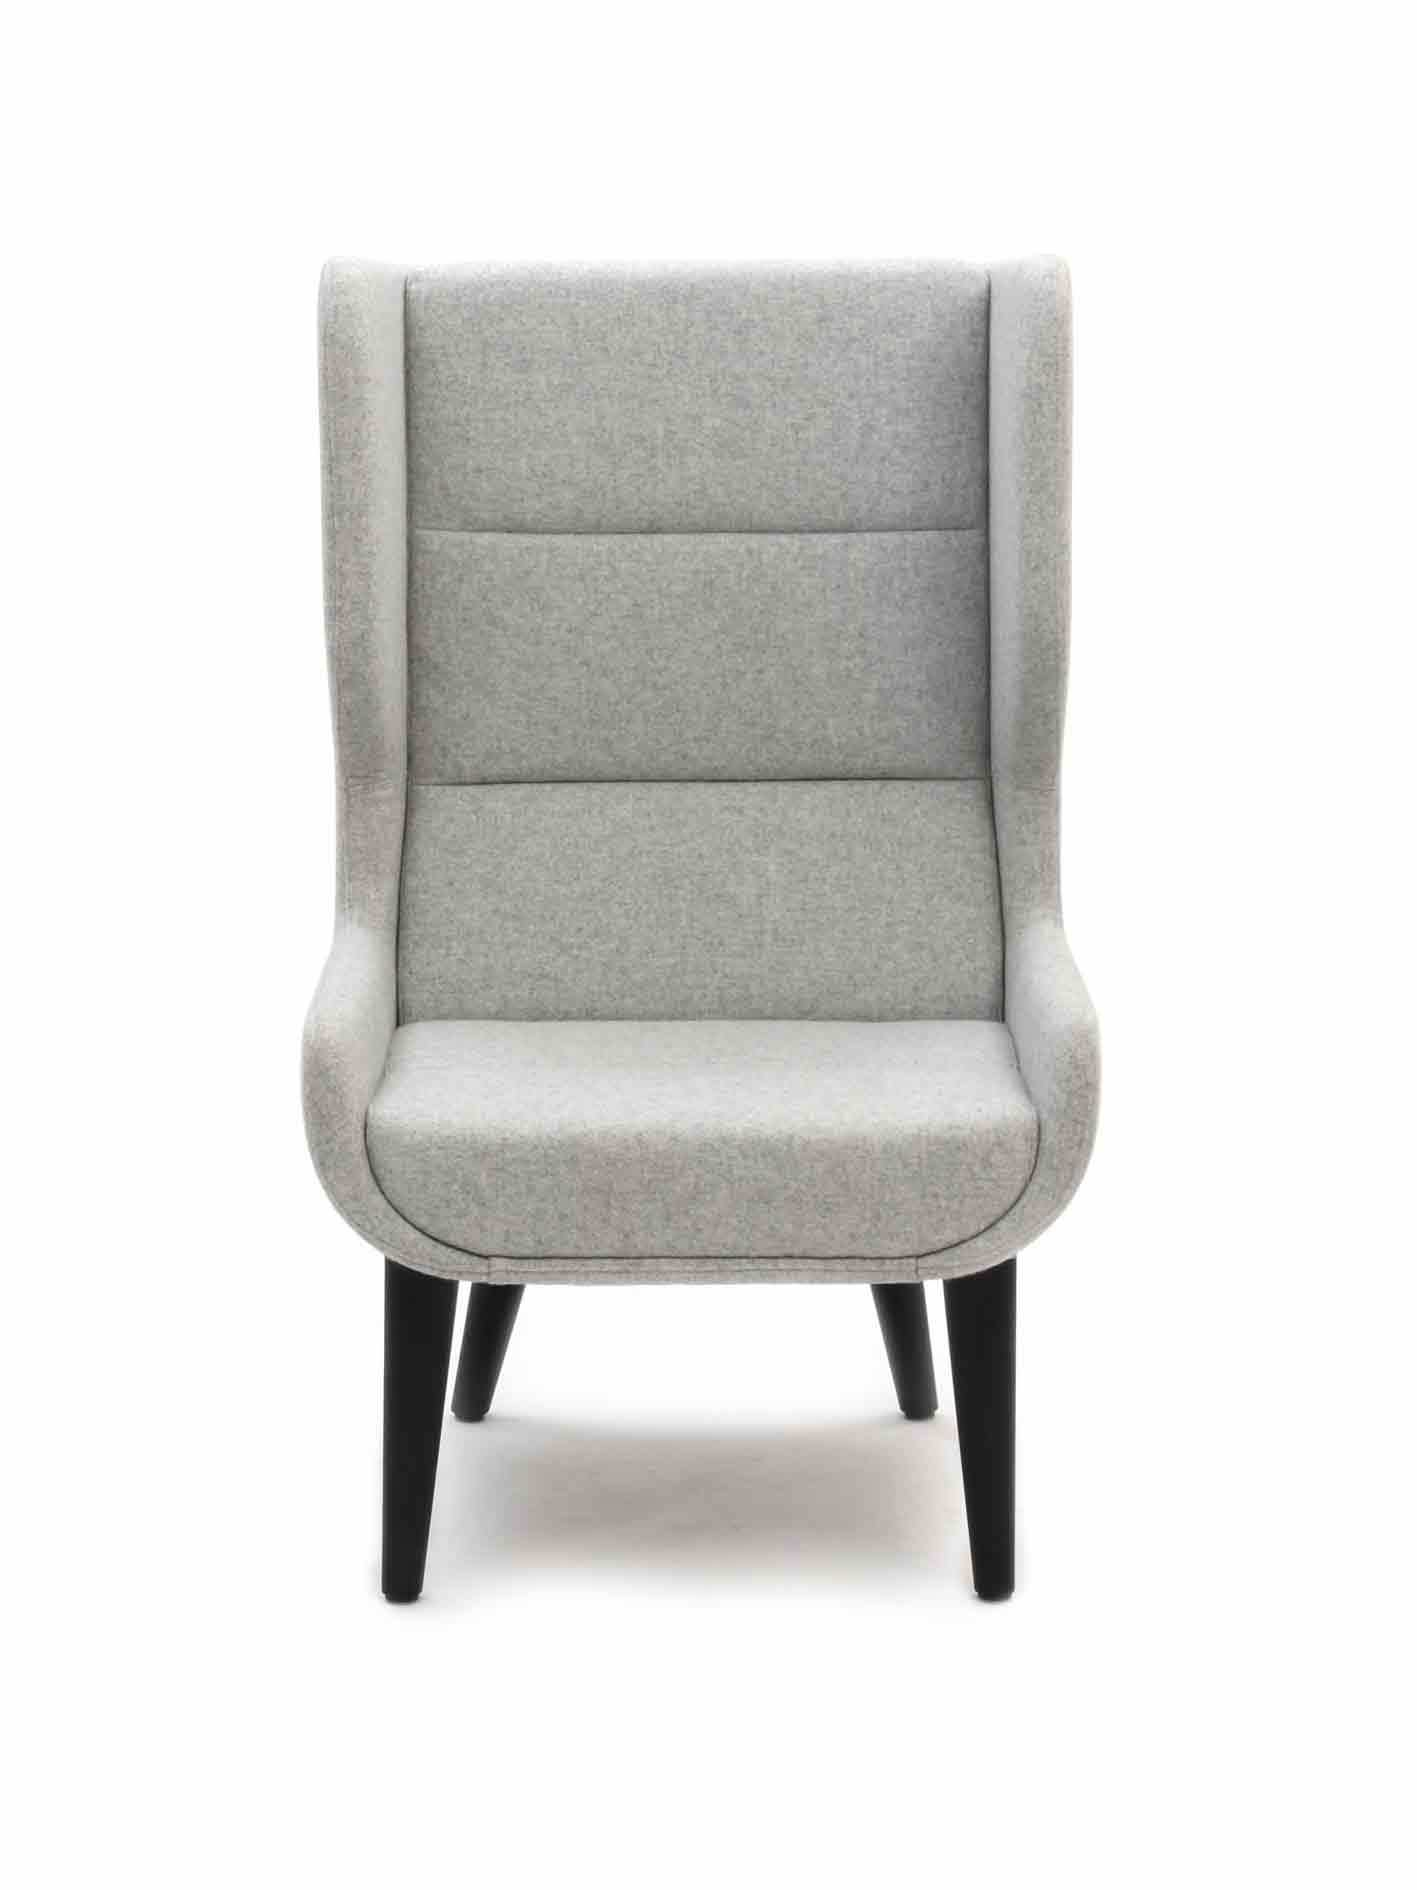 Hush Chair2